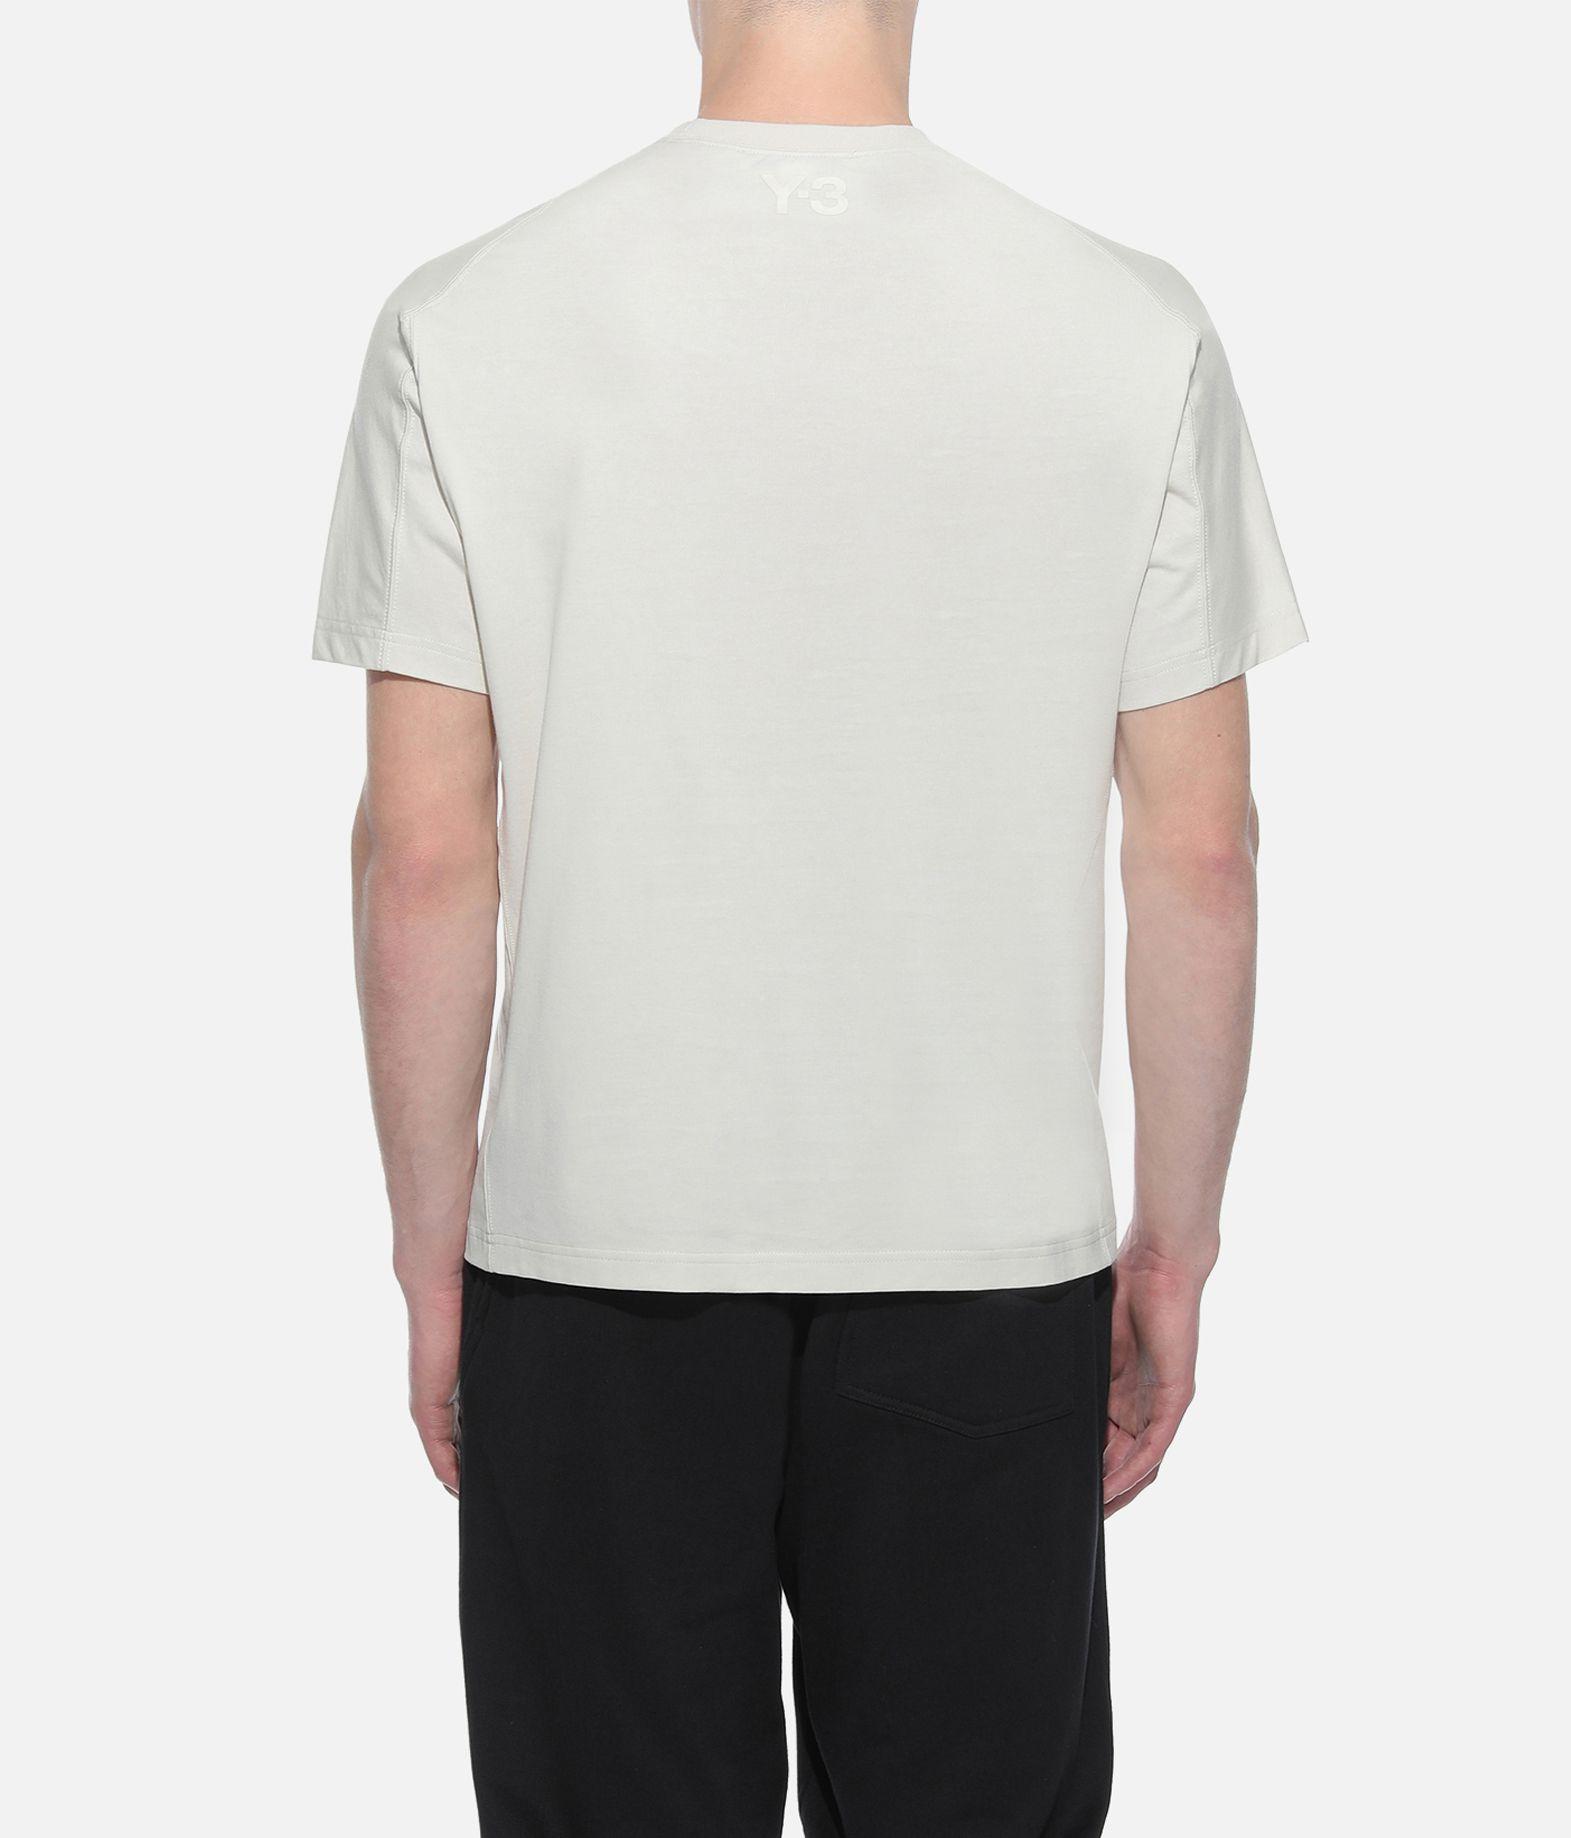 Y-3 Y-3 Yohji Letters Tee Short sleeve t-shirt Man d